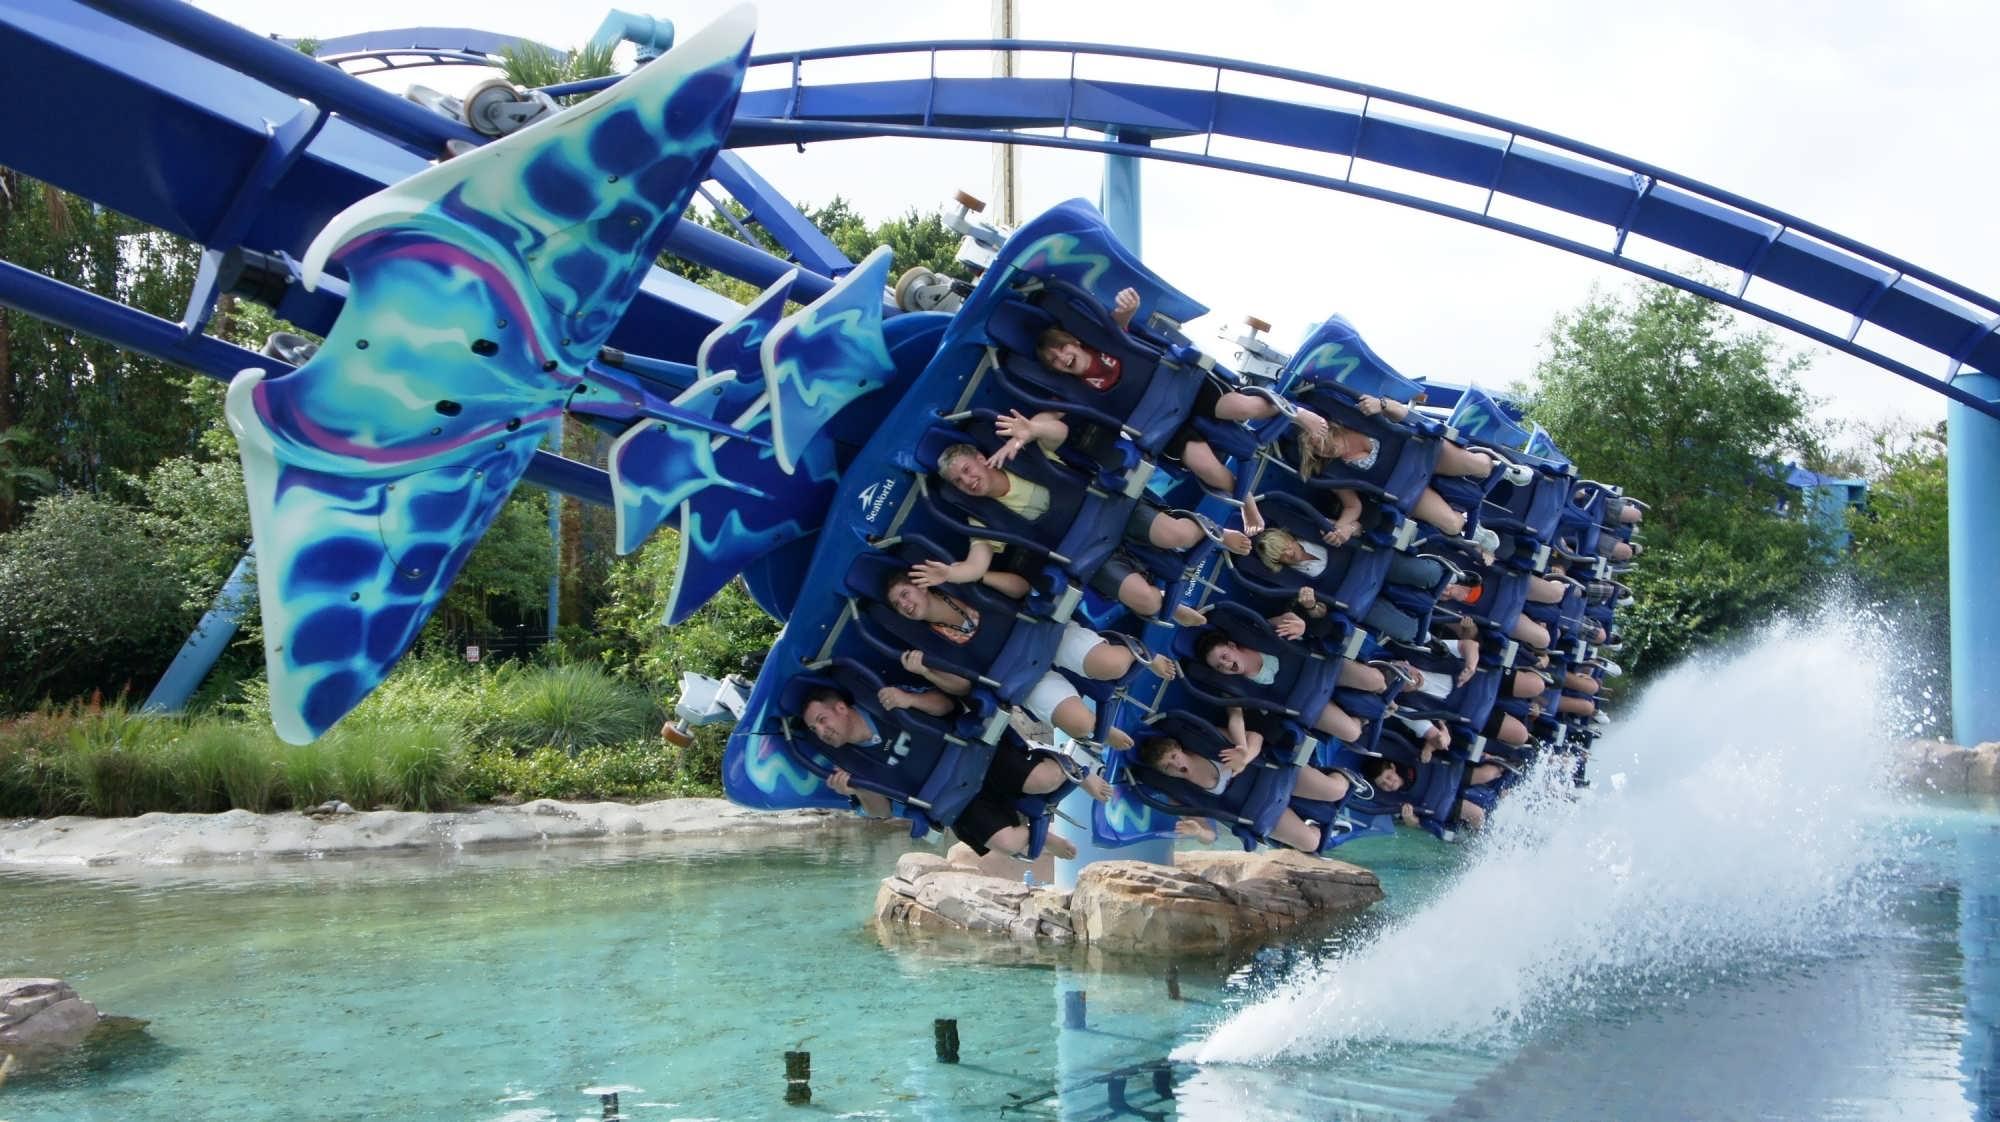 Kraken at SeaWorld Orlando